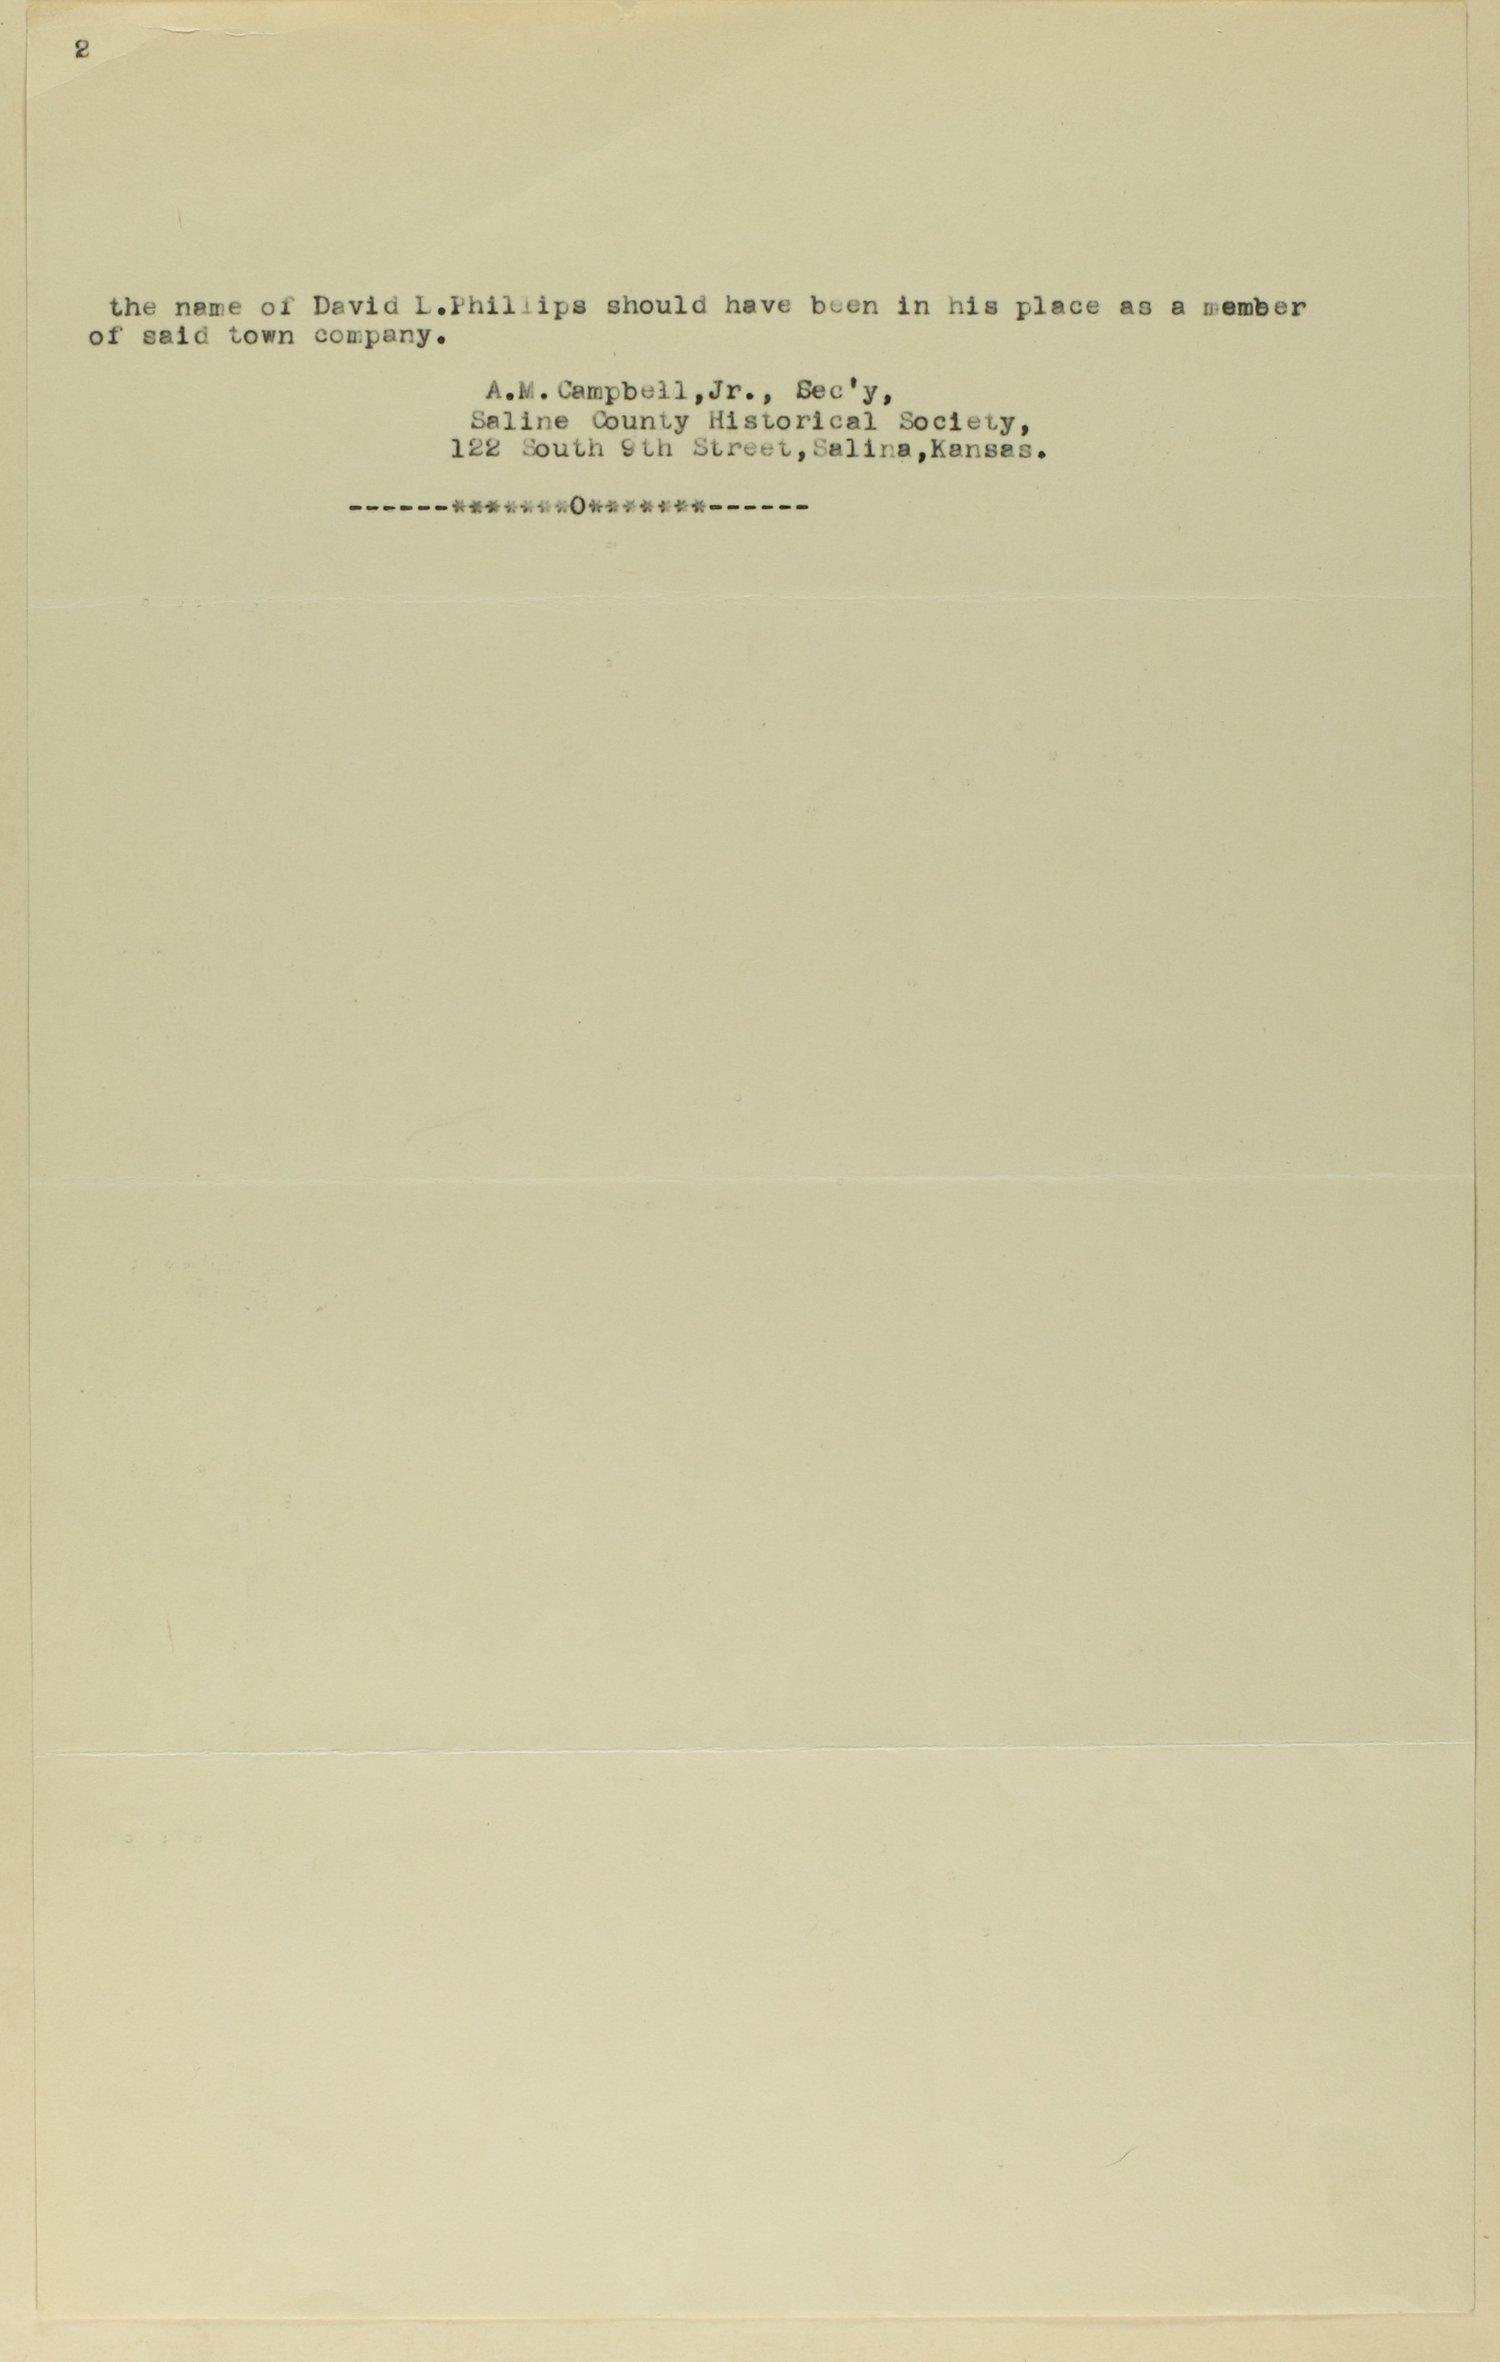 Edwards' Atlas of Saline Co., Kansas - insert